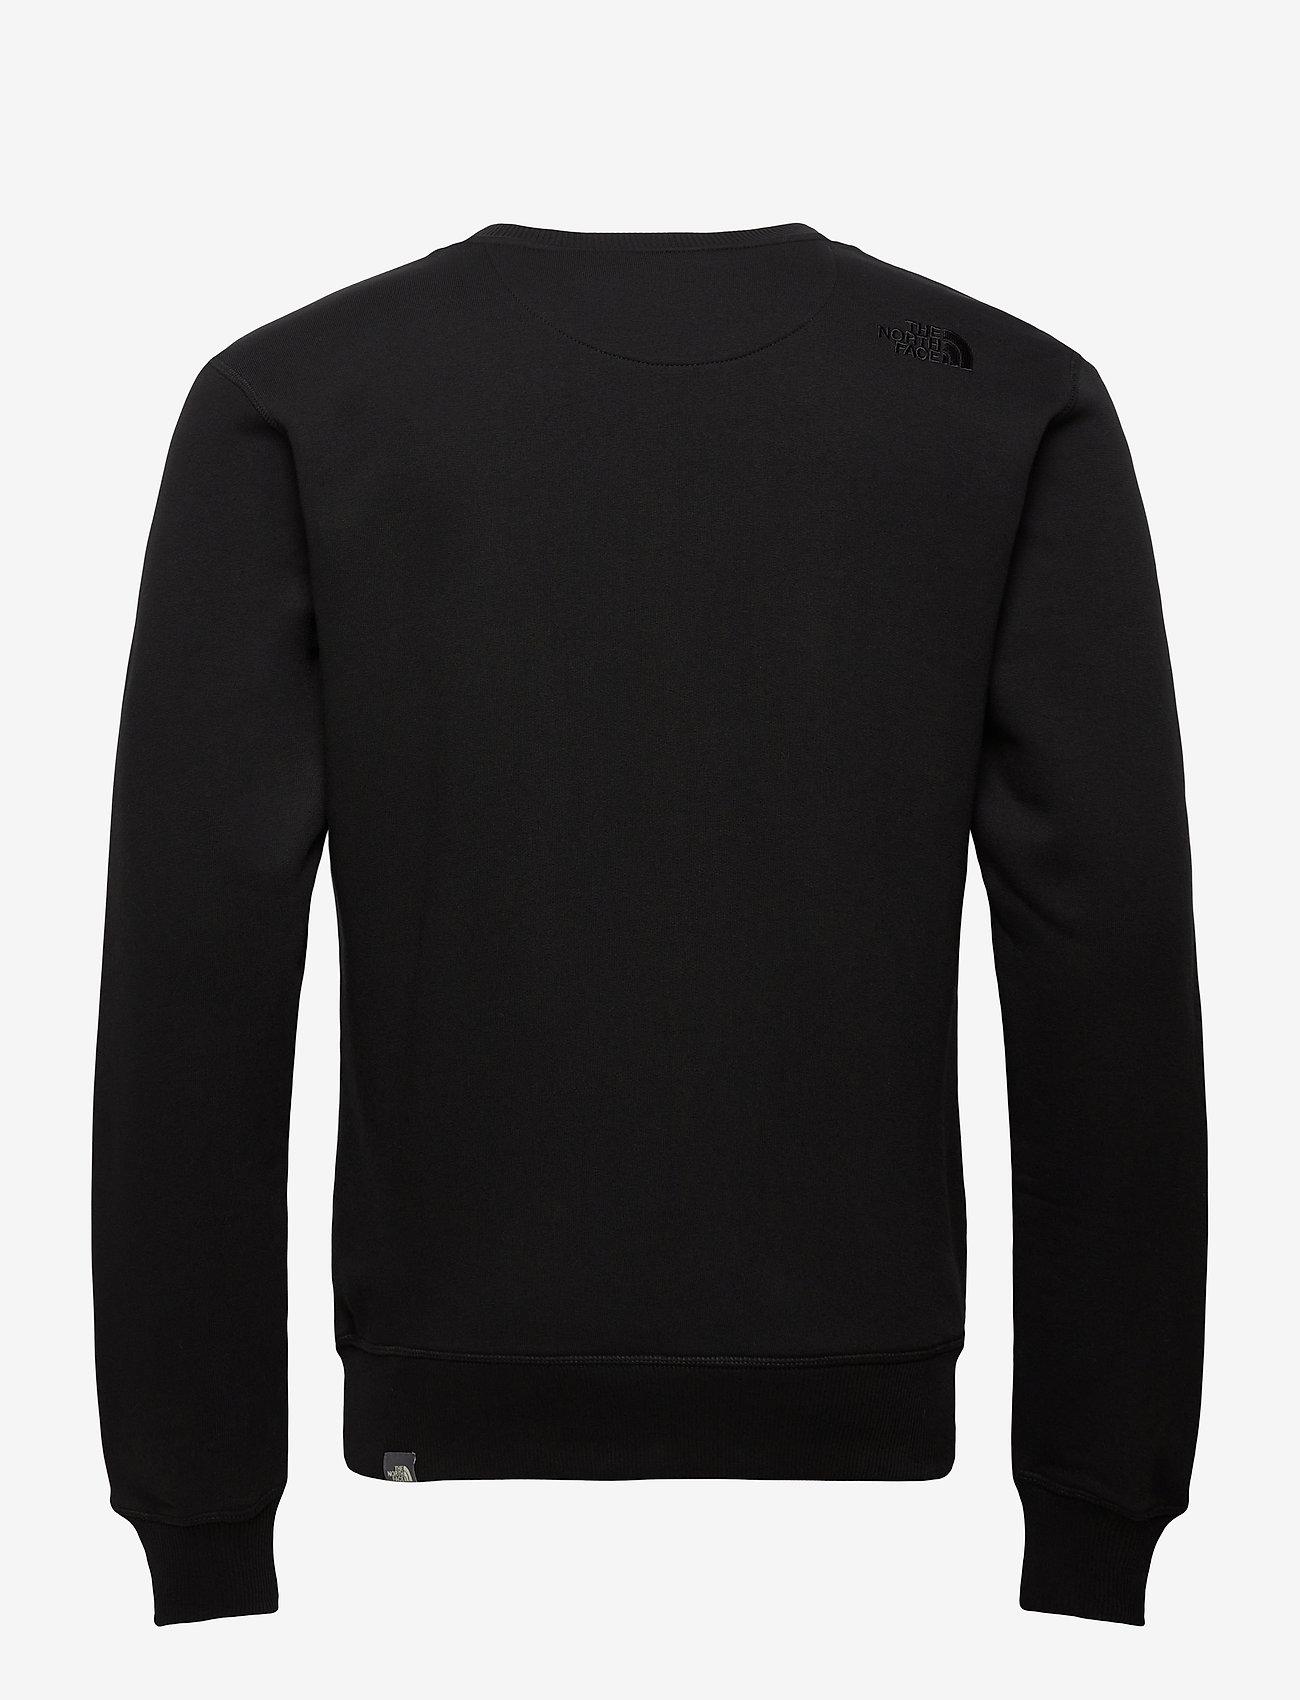 The North Face - M DREW PEAK CREW - sweats - tnf black - 1